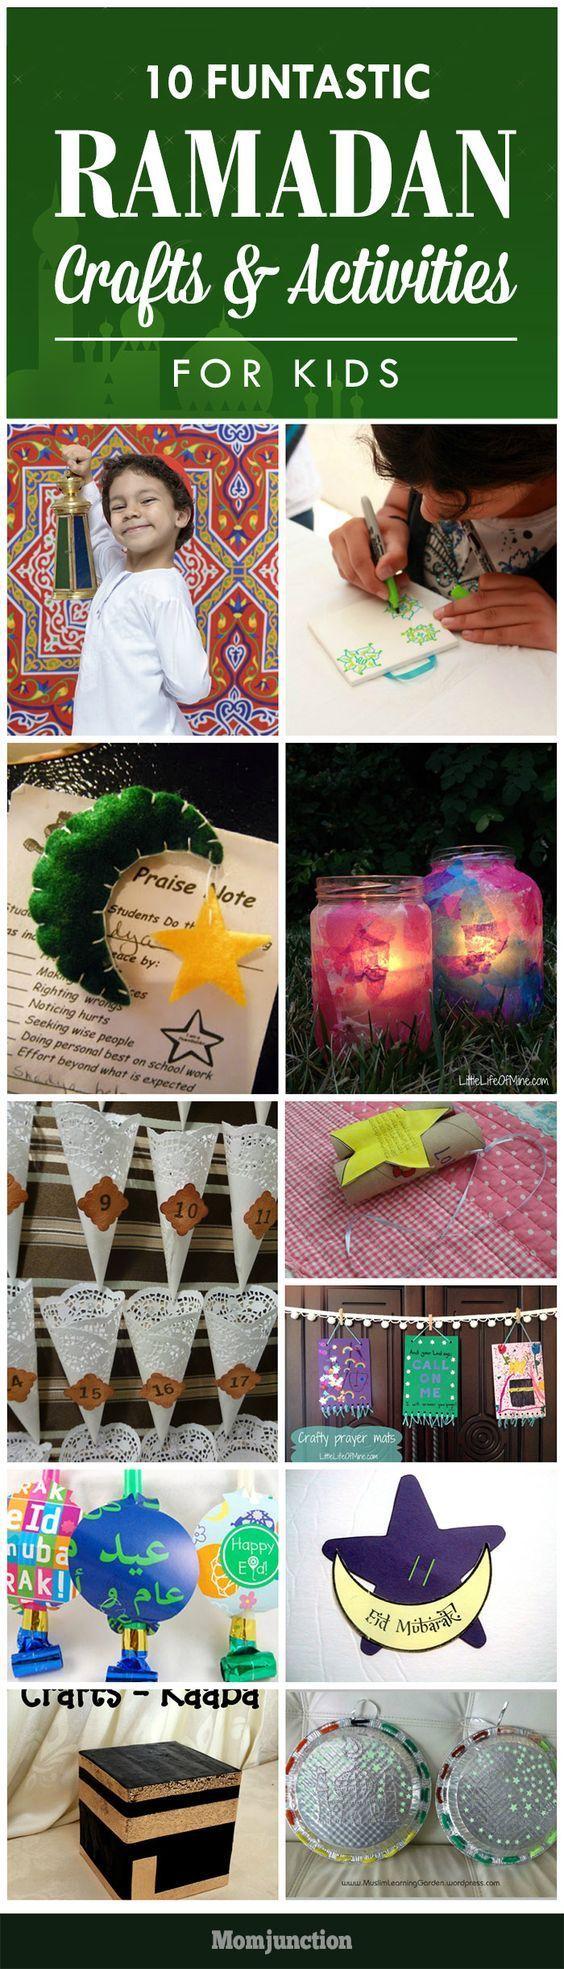 10 Funtastic Ramadan Crafts And Activities For Kids